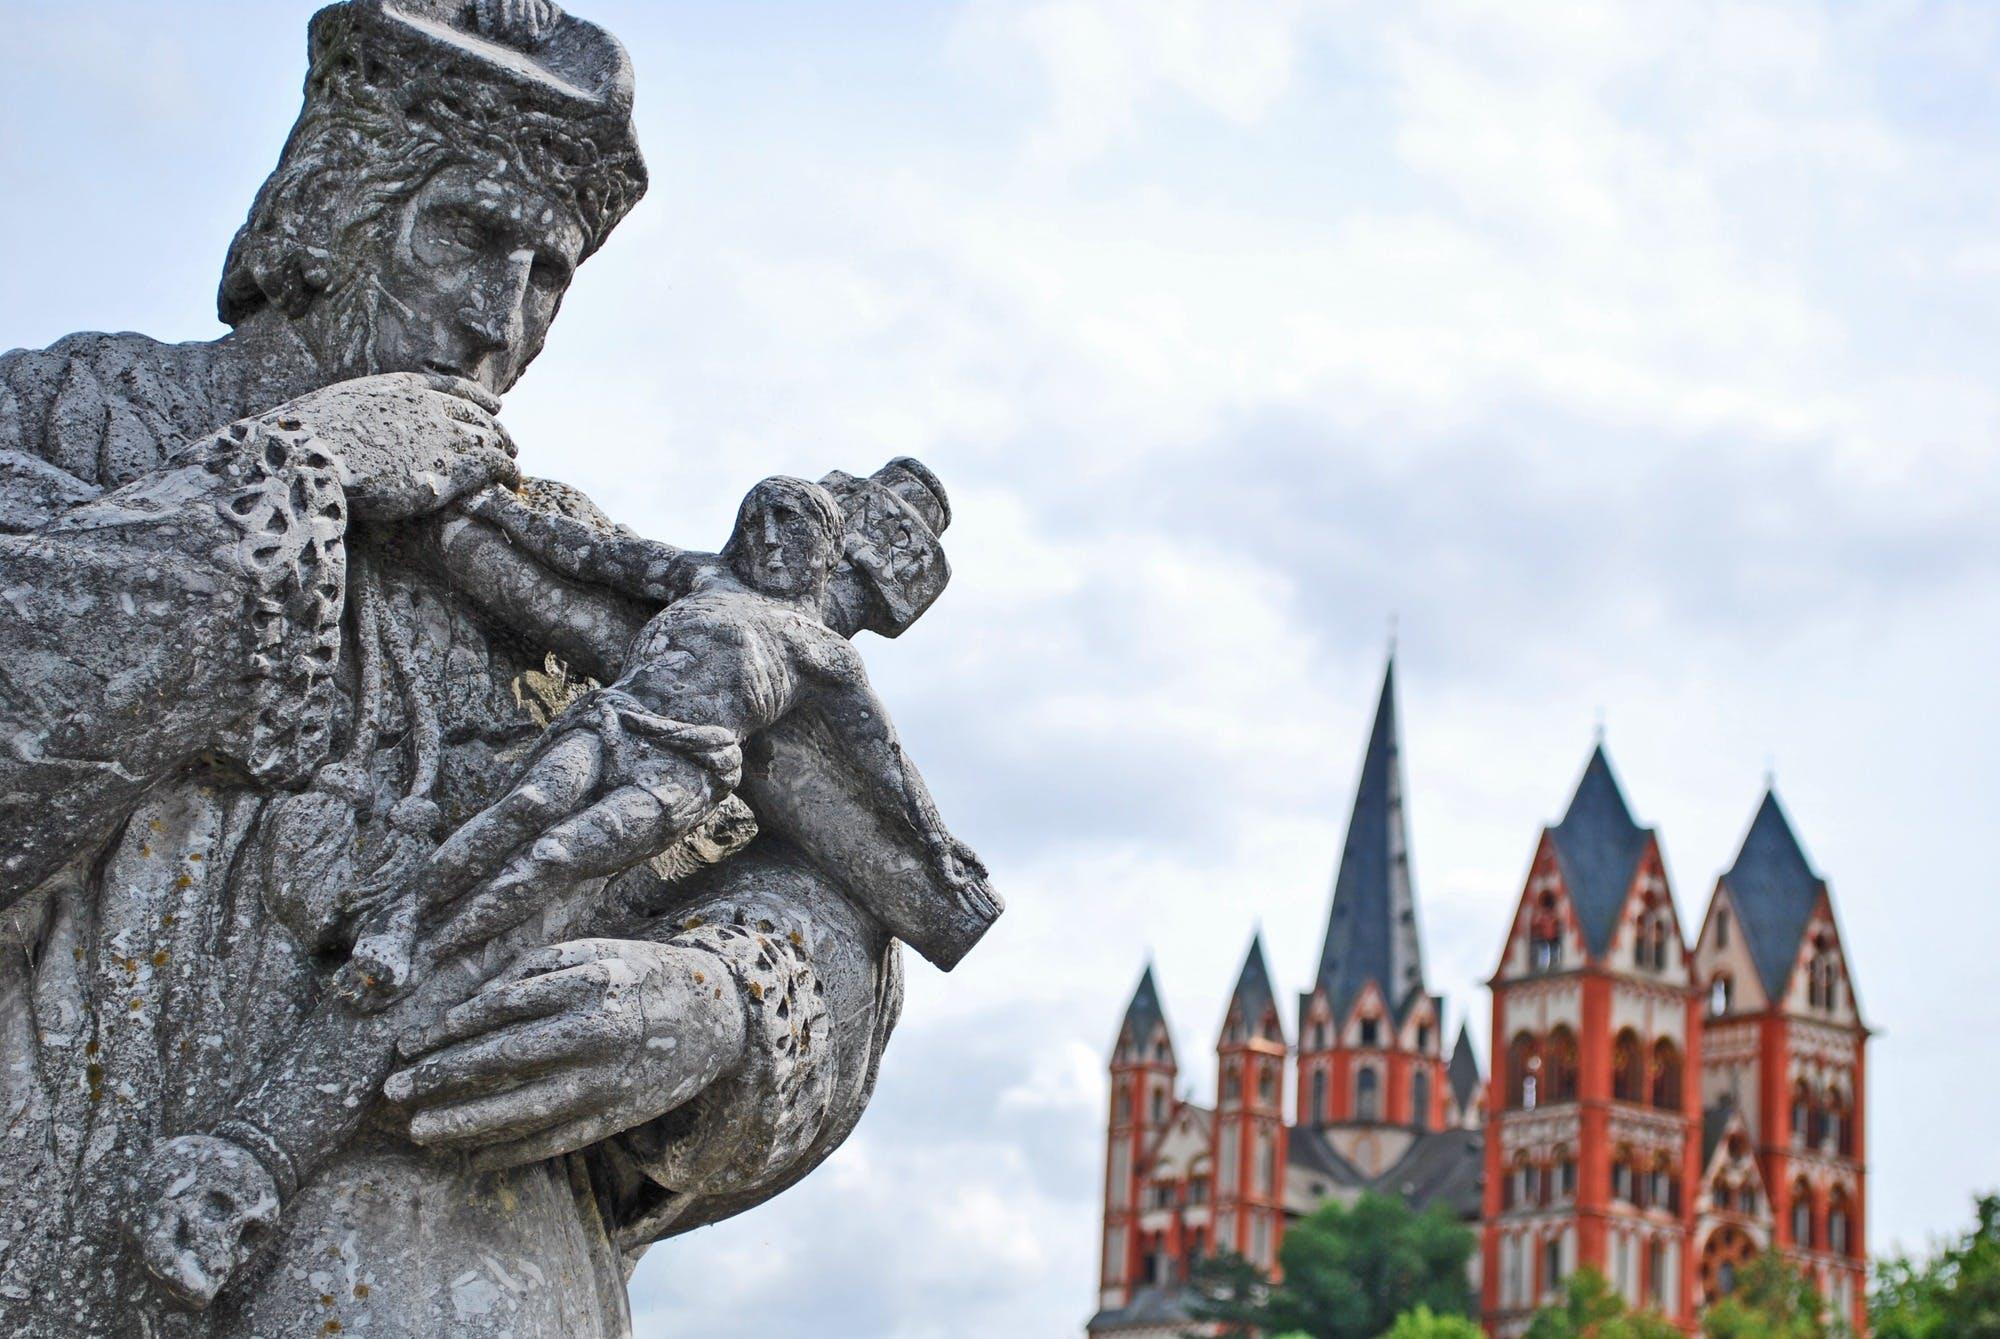 Man Holding Man on Cross Gray Statue